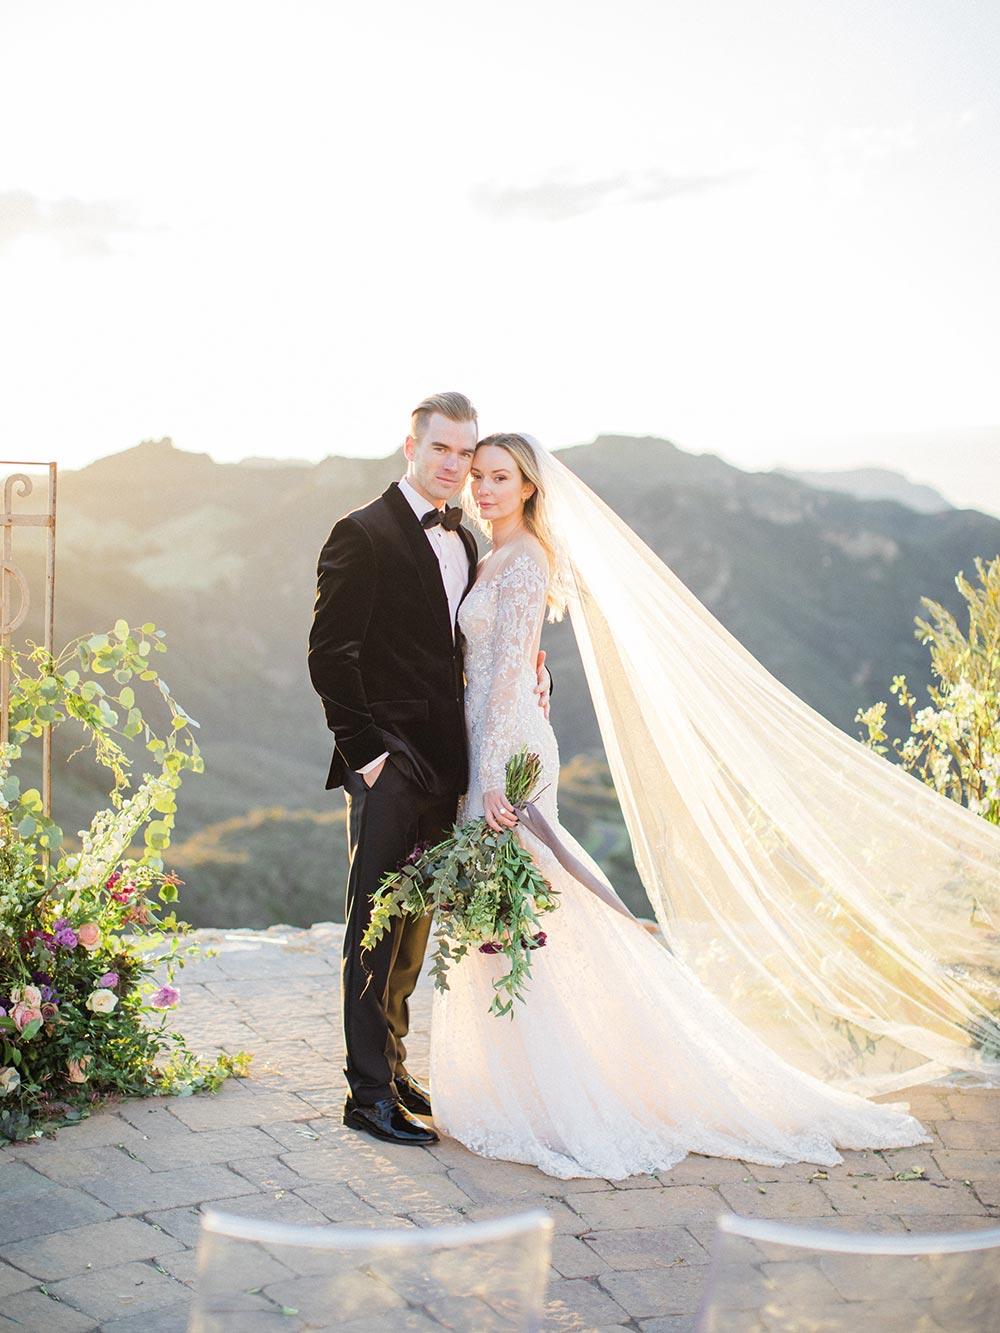 long sleeve embellished wedding dress with veil and black velvet groom tux